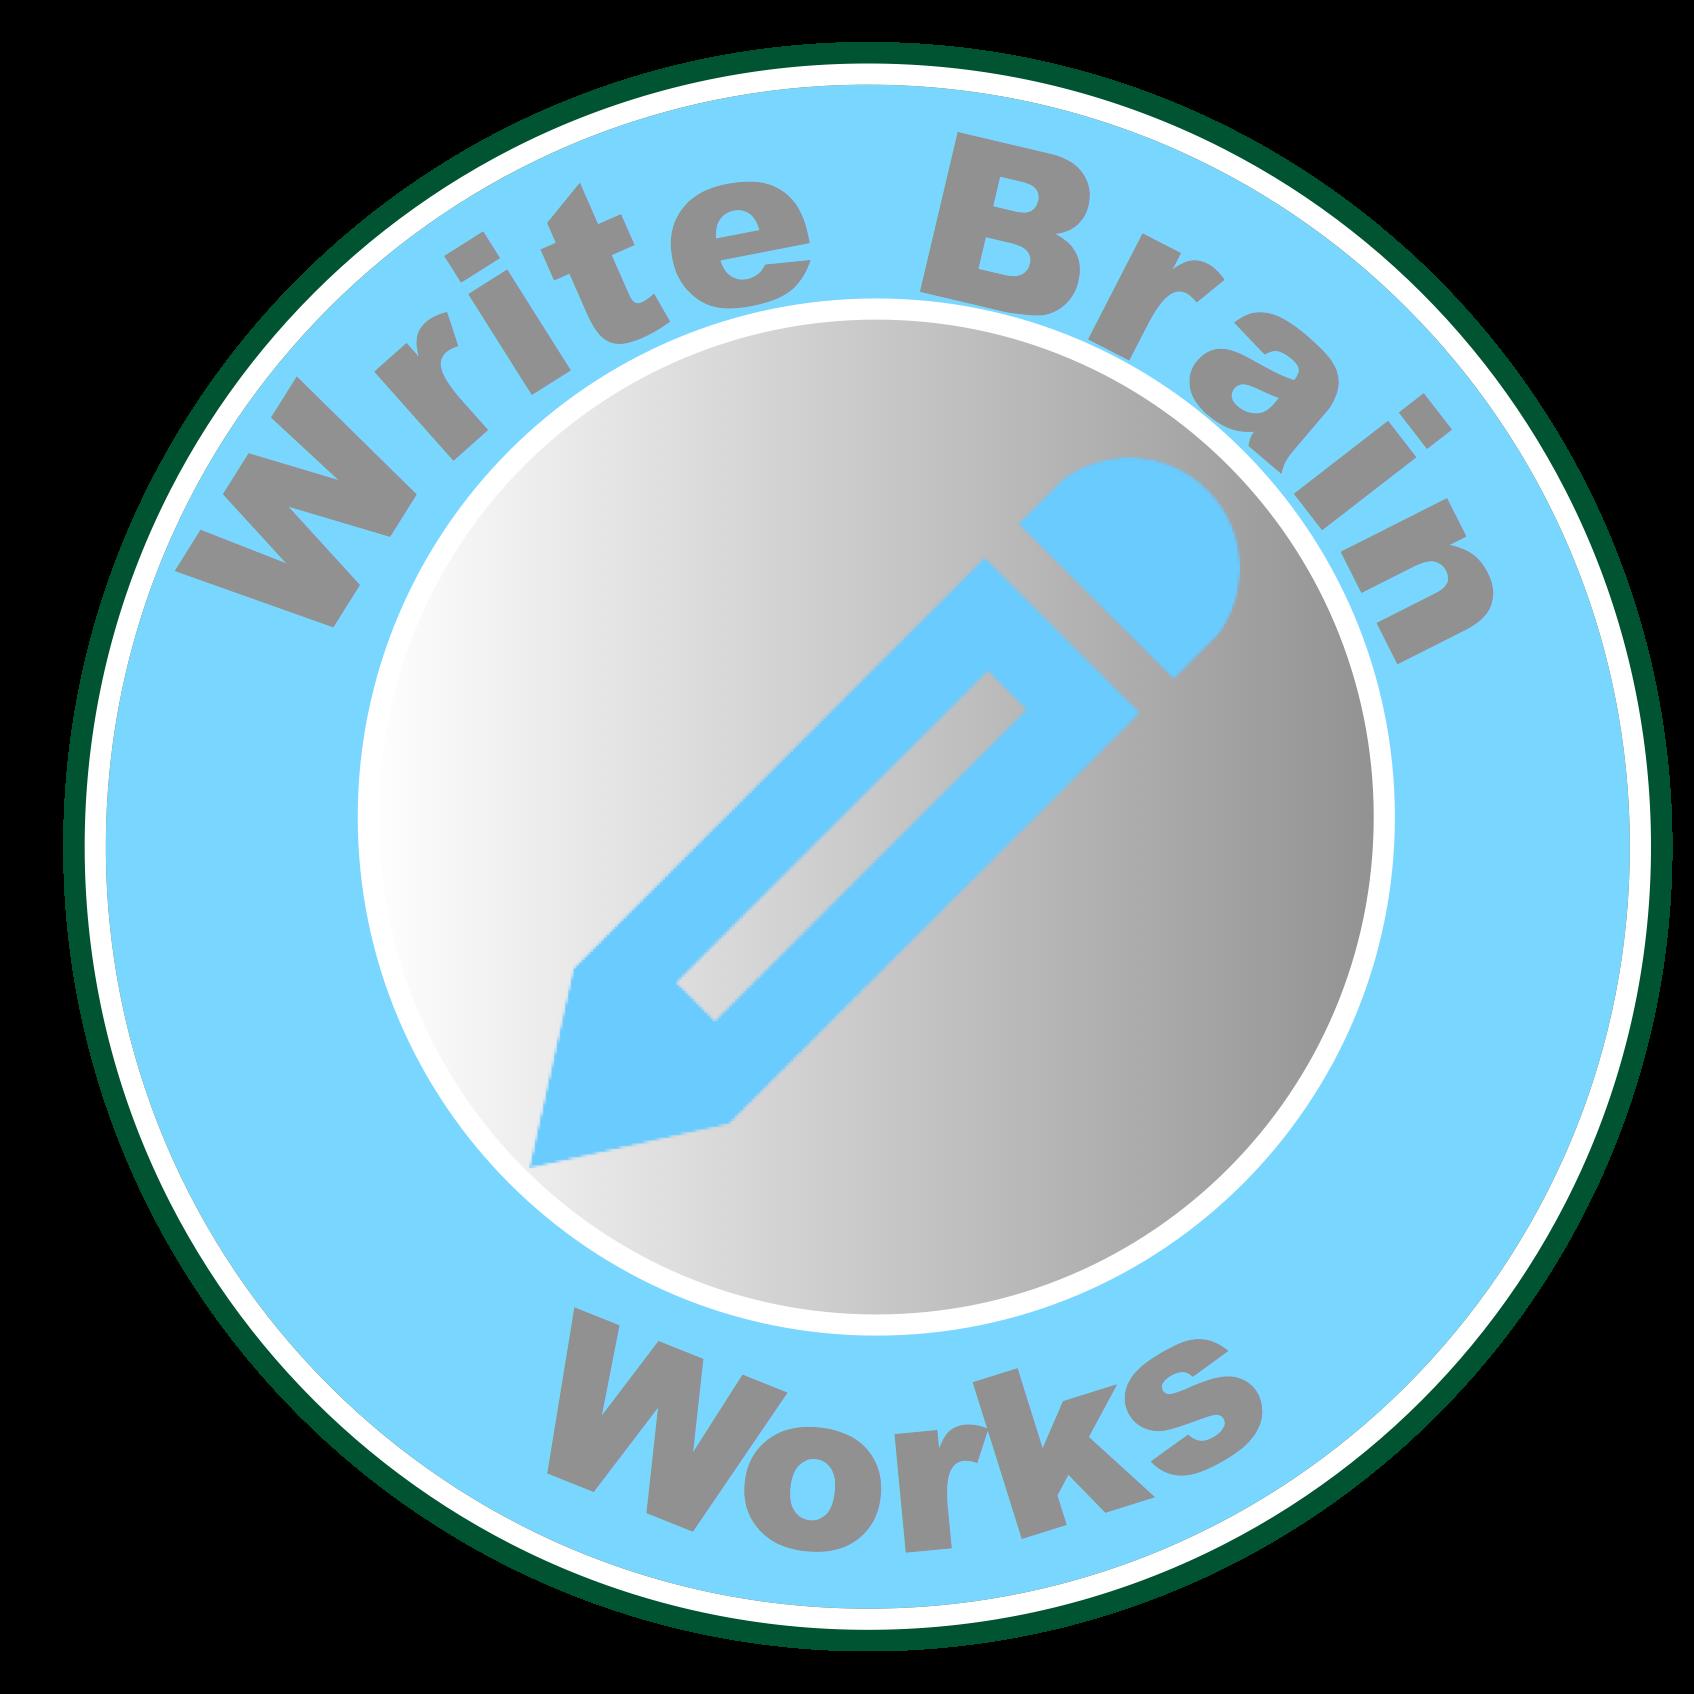 Grammar clipart auxiliary verb. Write brain works everything